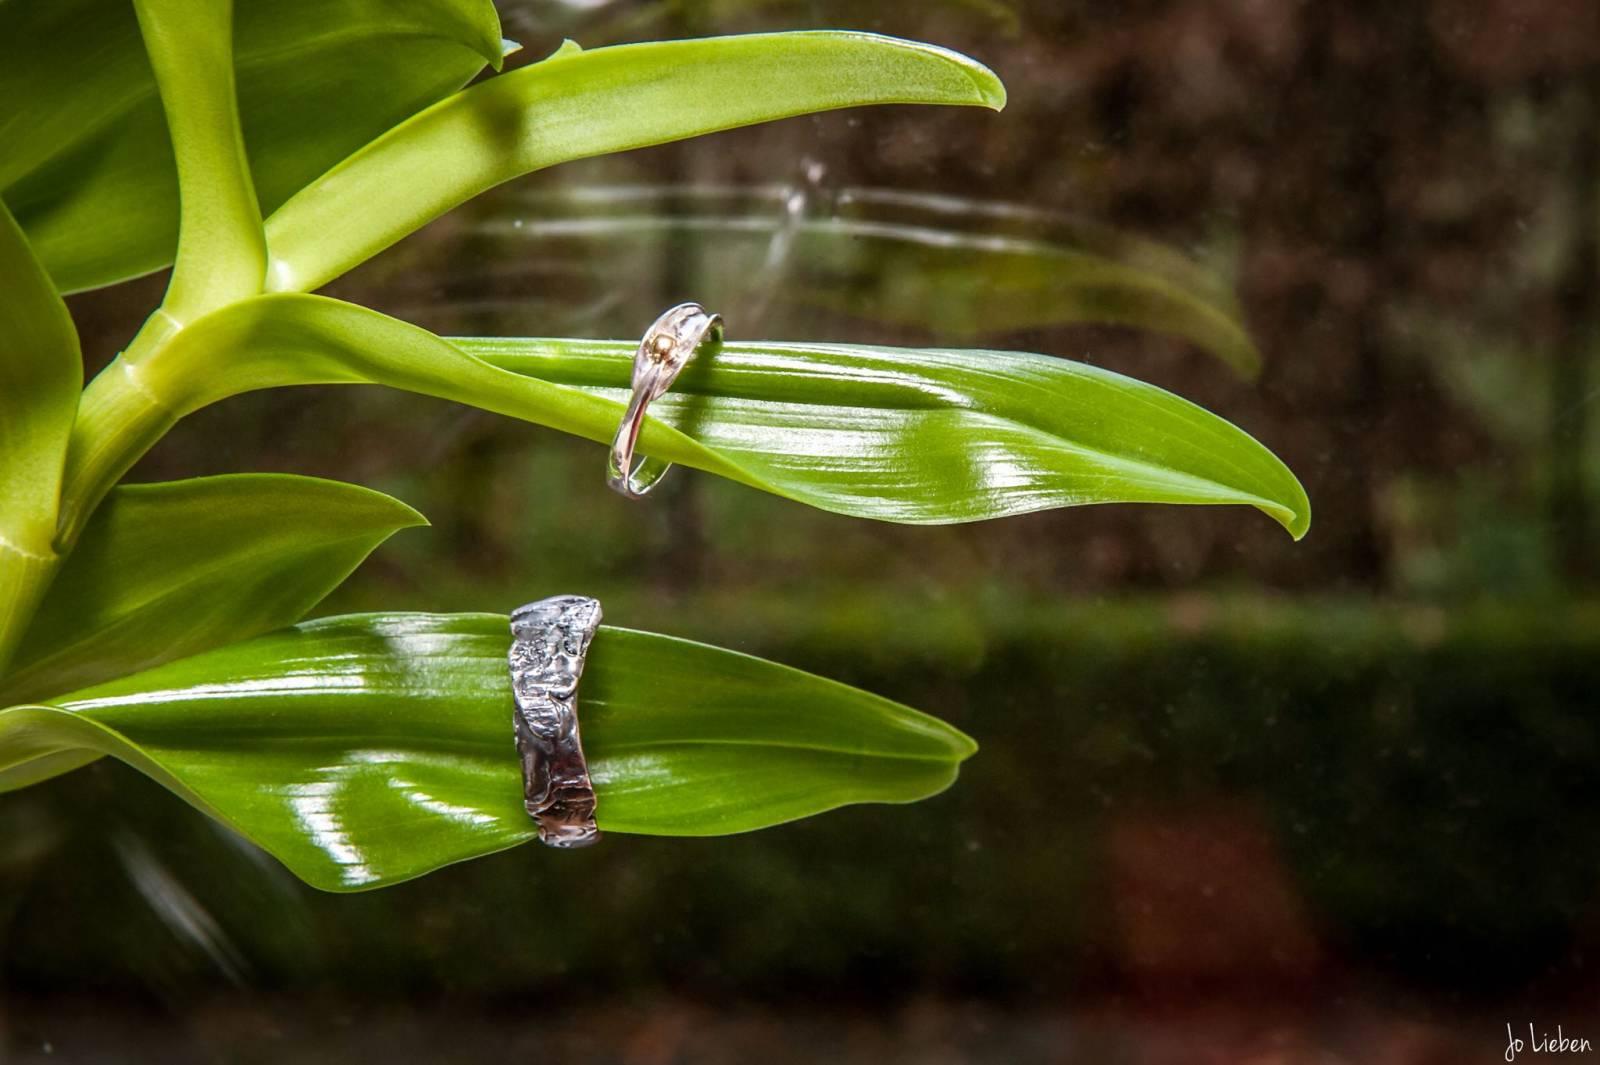 Nathalie Swinnen - Juwelen - Bruidsjuwelen - Verlovingsring - Trouwring - House of Weddings - 35